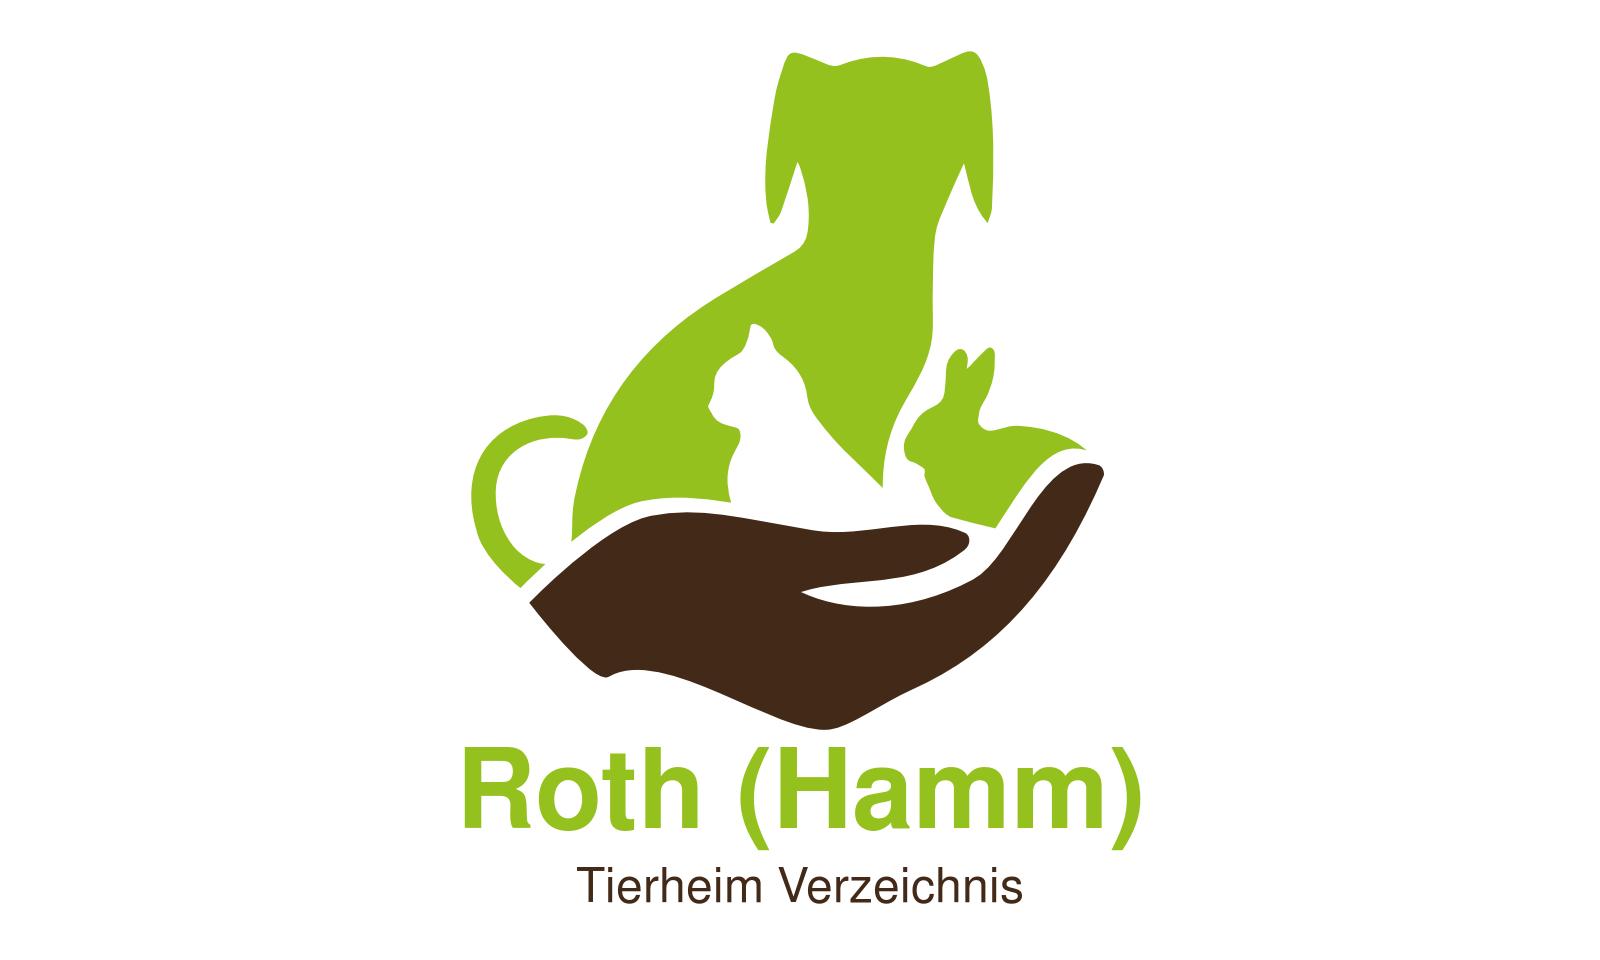 Tierheim Roth (Hamm)